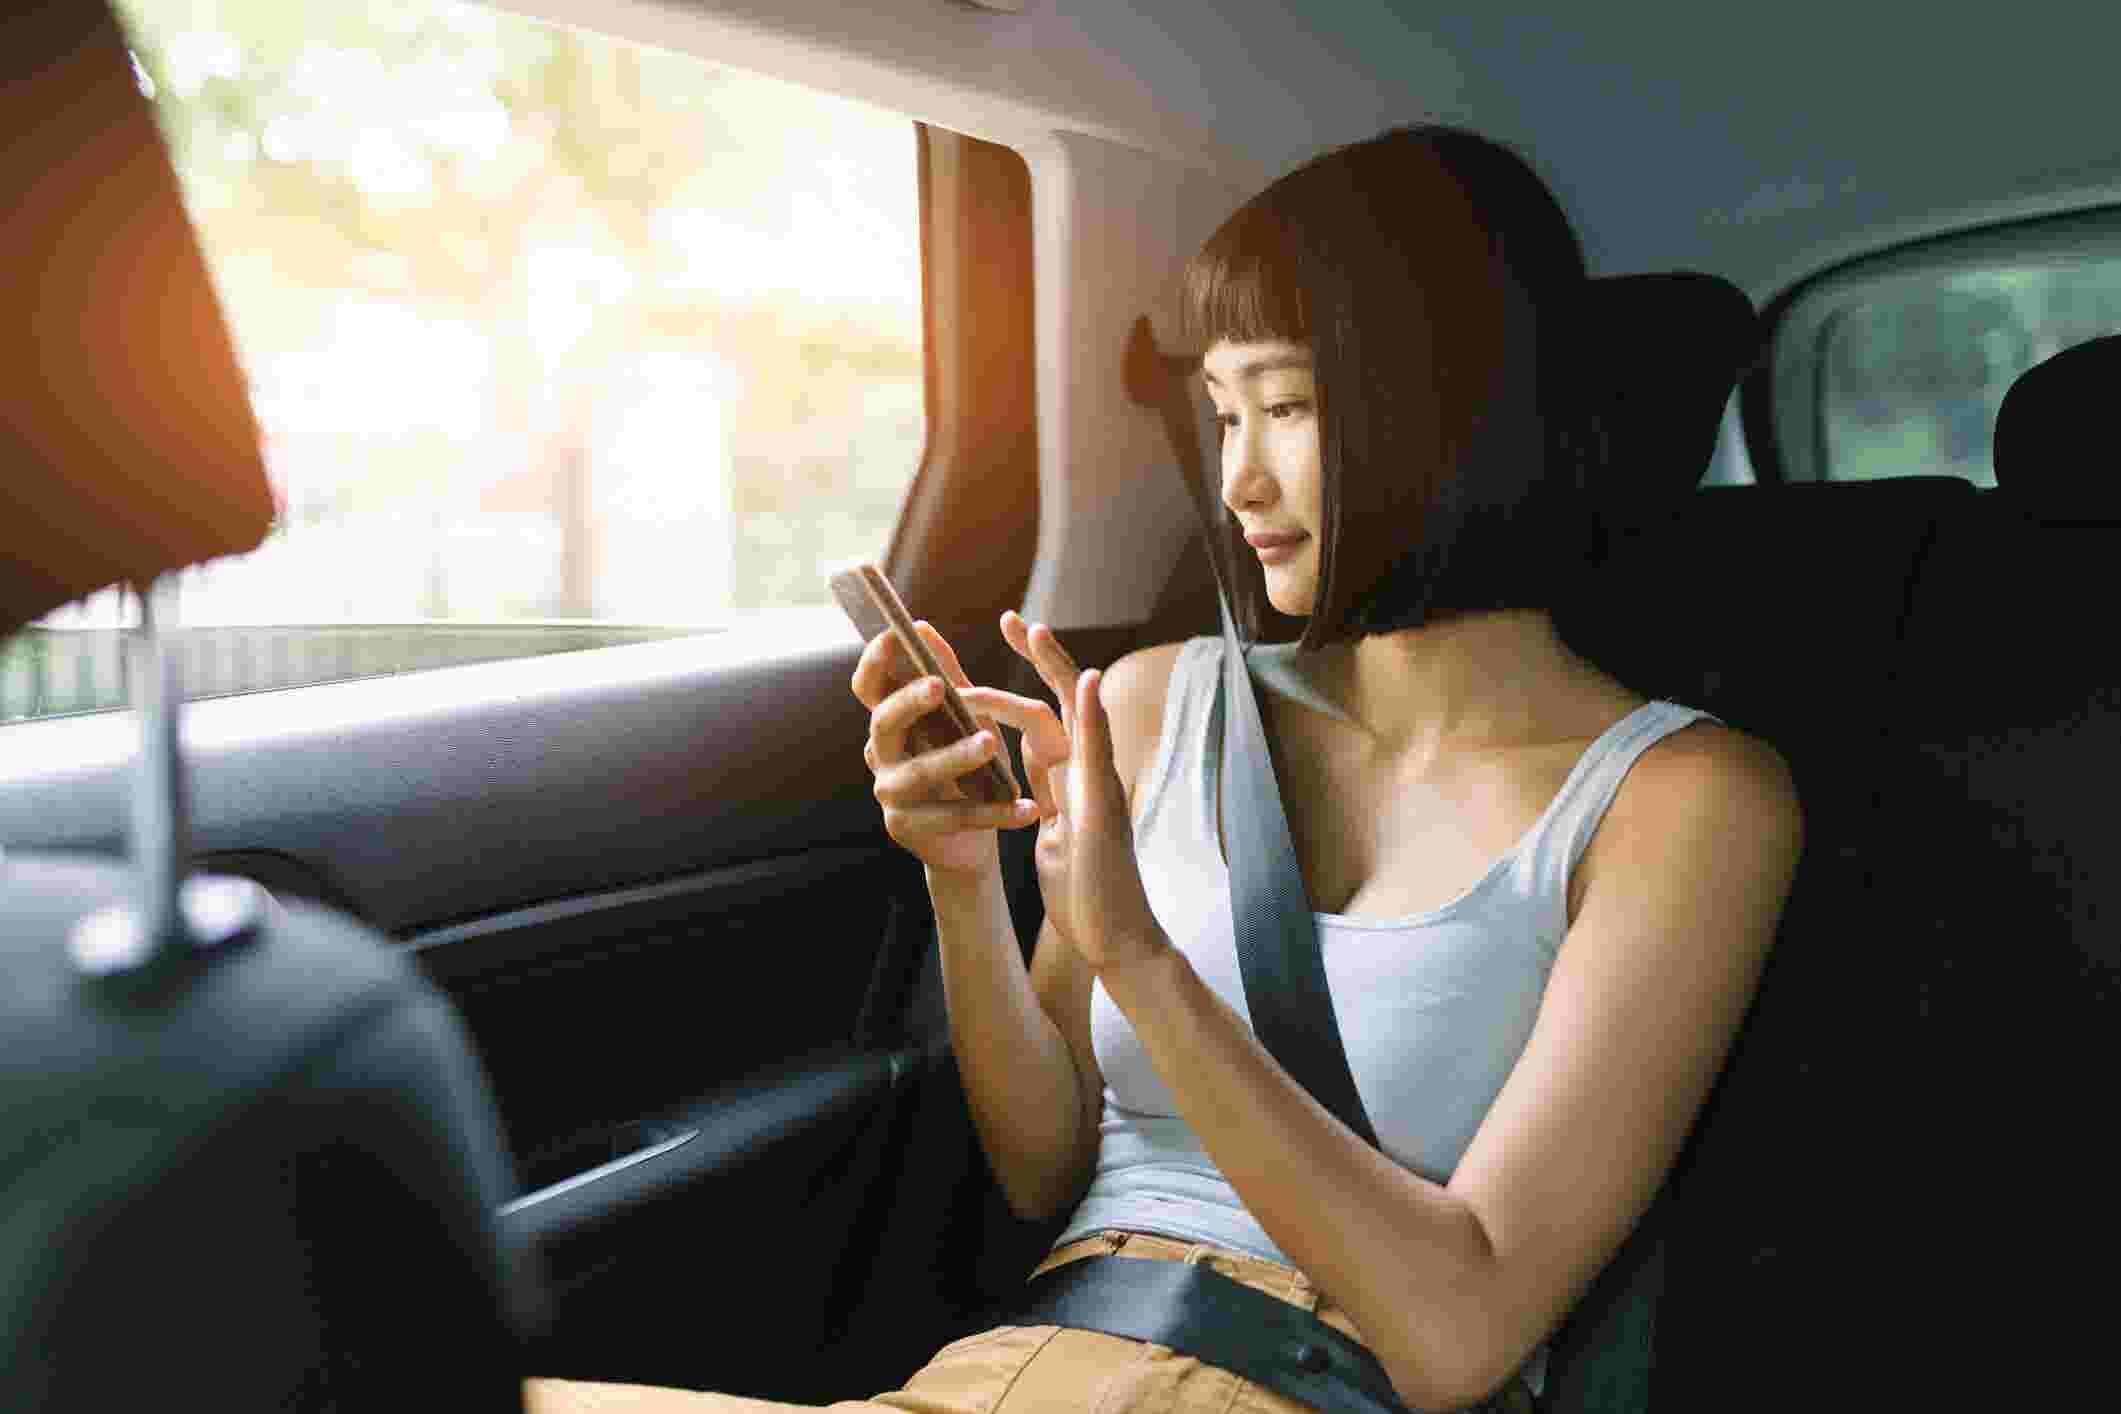 Uber offering new 'Quiet Driver' mode